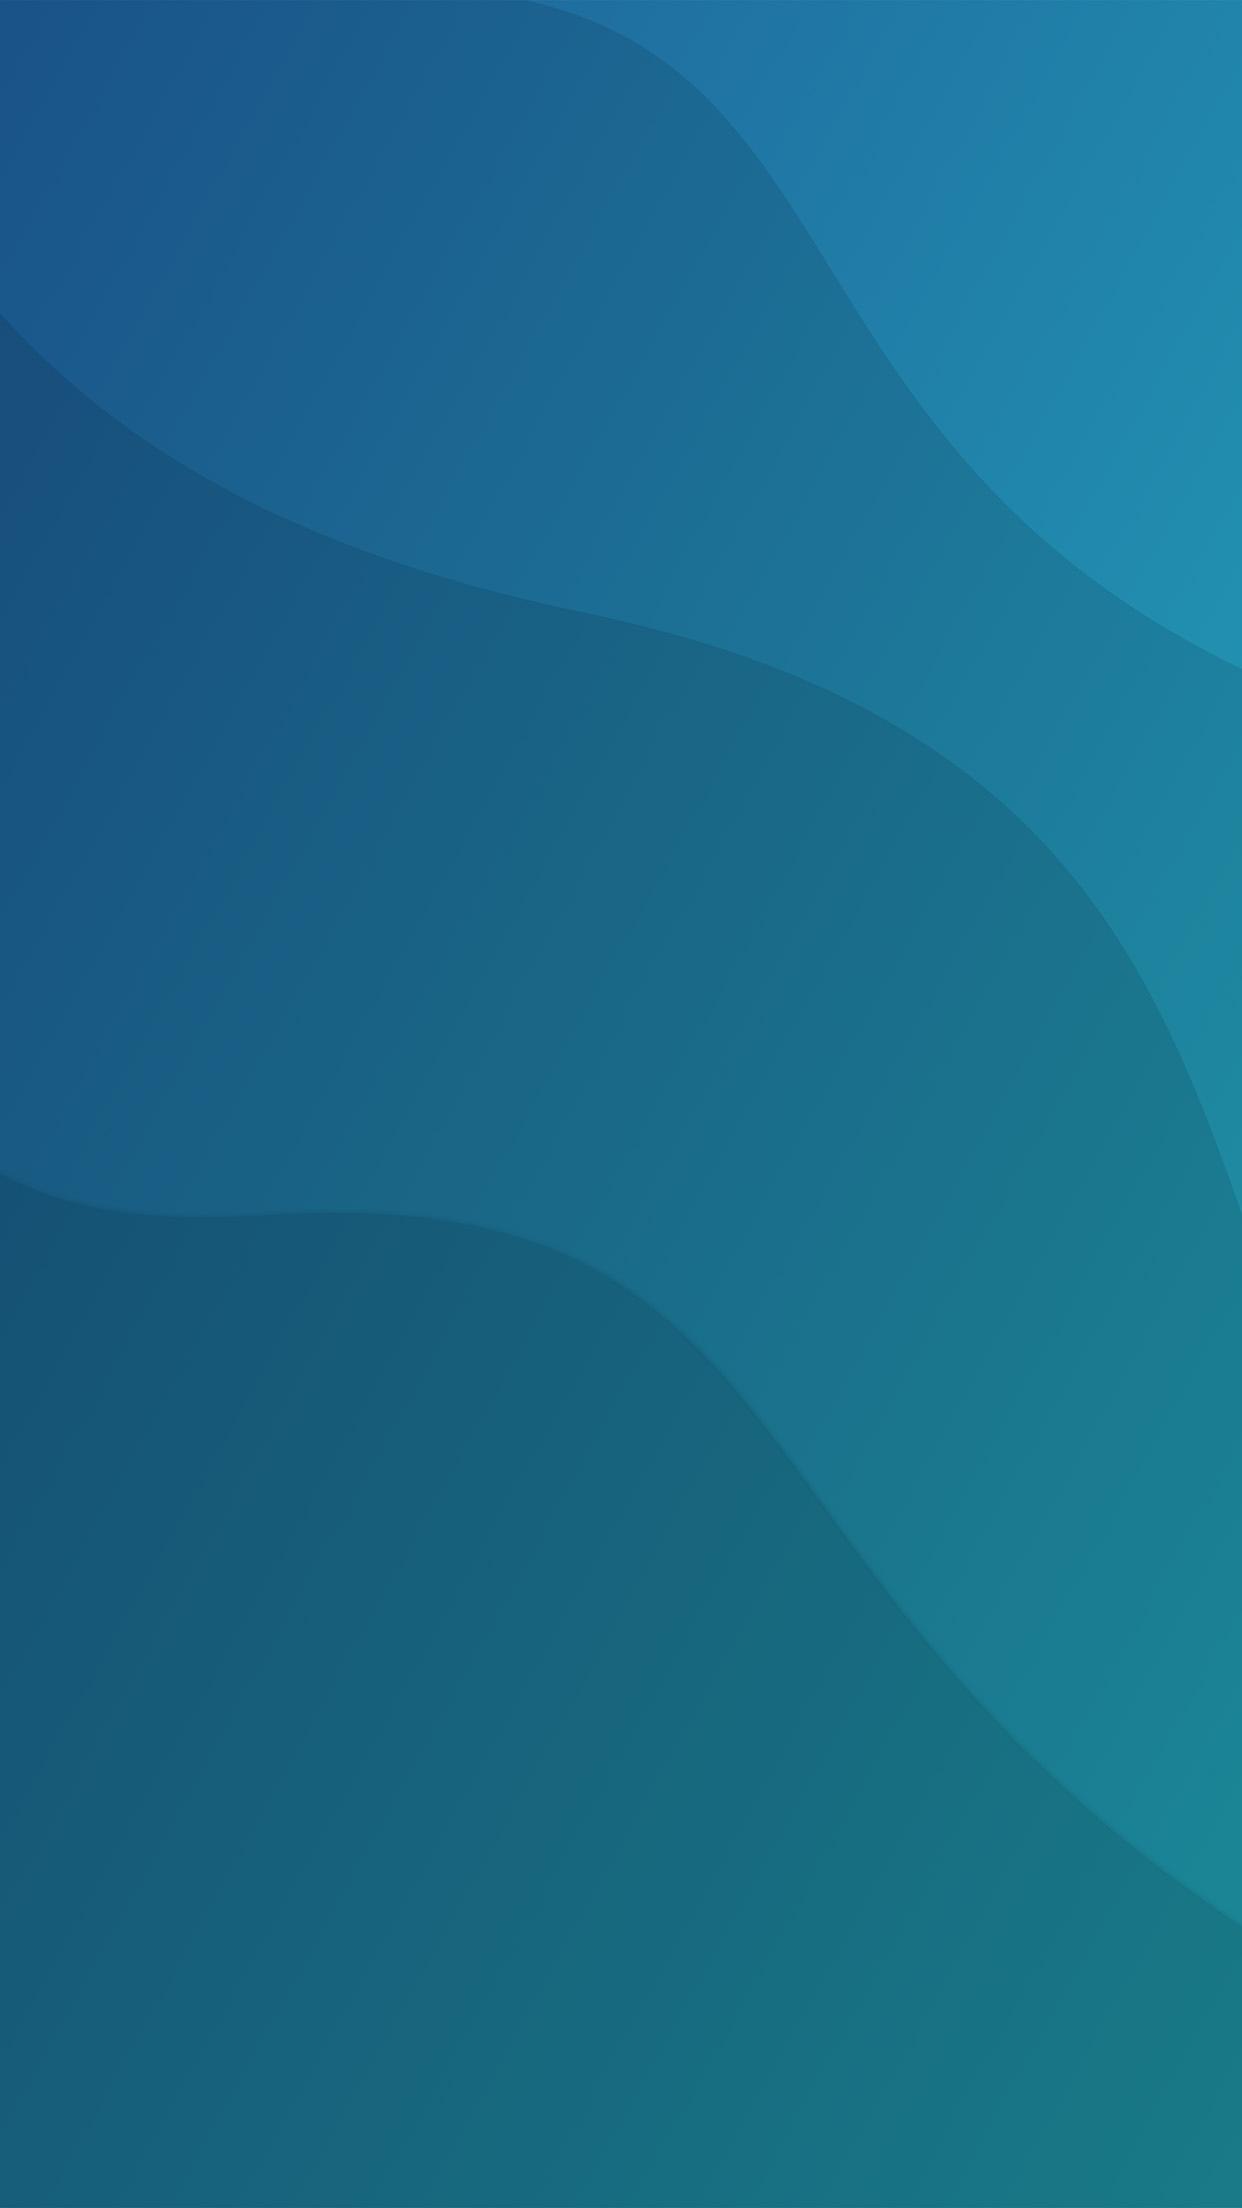 iPhone Duvar Kağıdı-vy73-wave-color-blue-pattern-background-iphone-plus-wallpaper